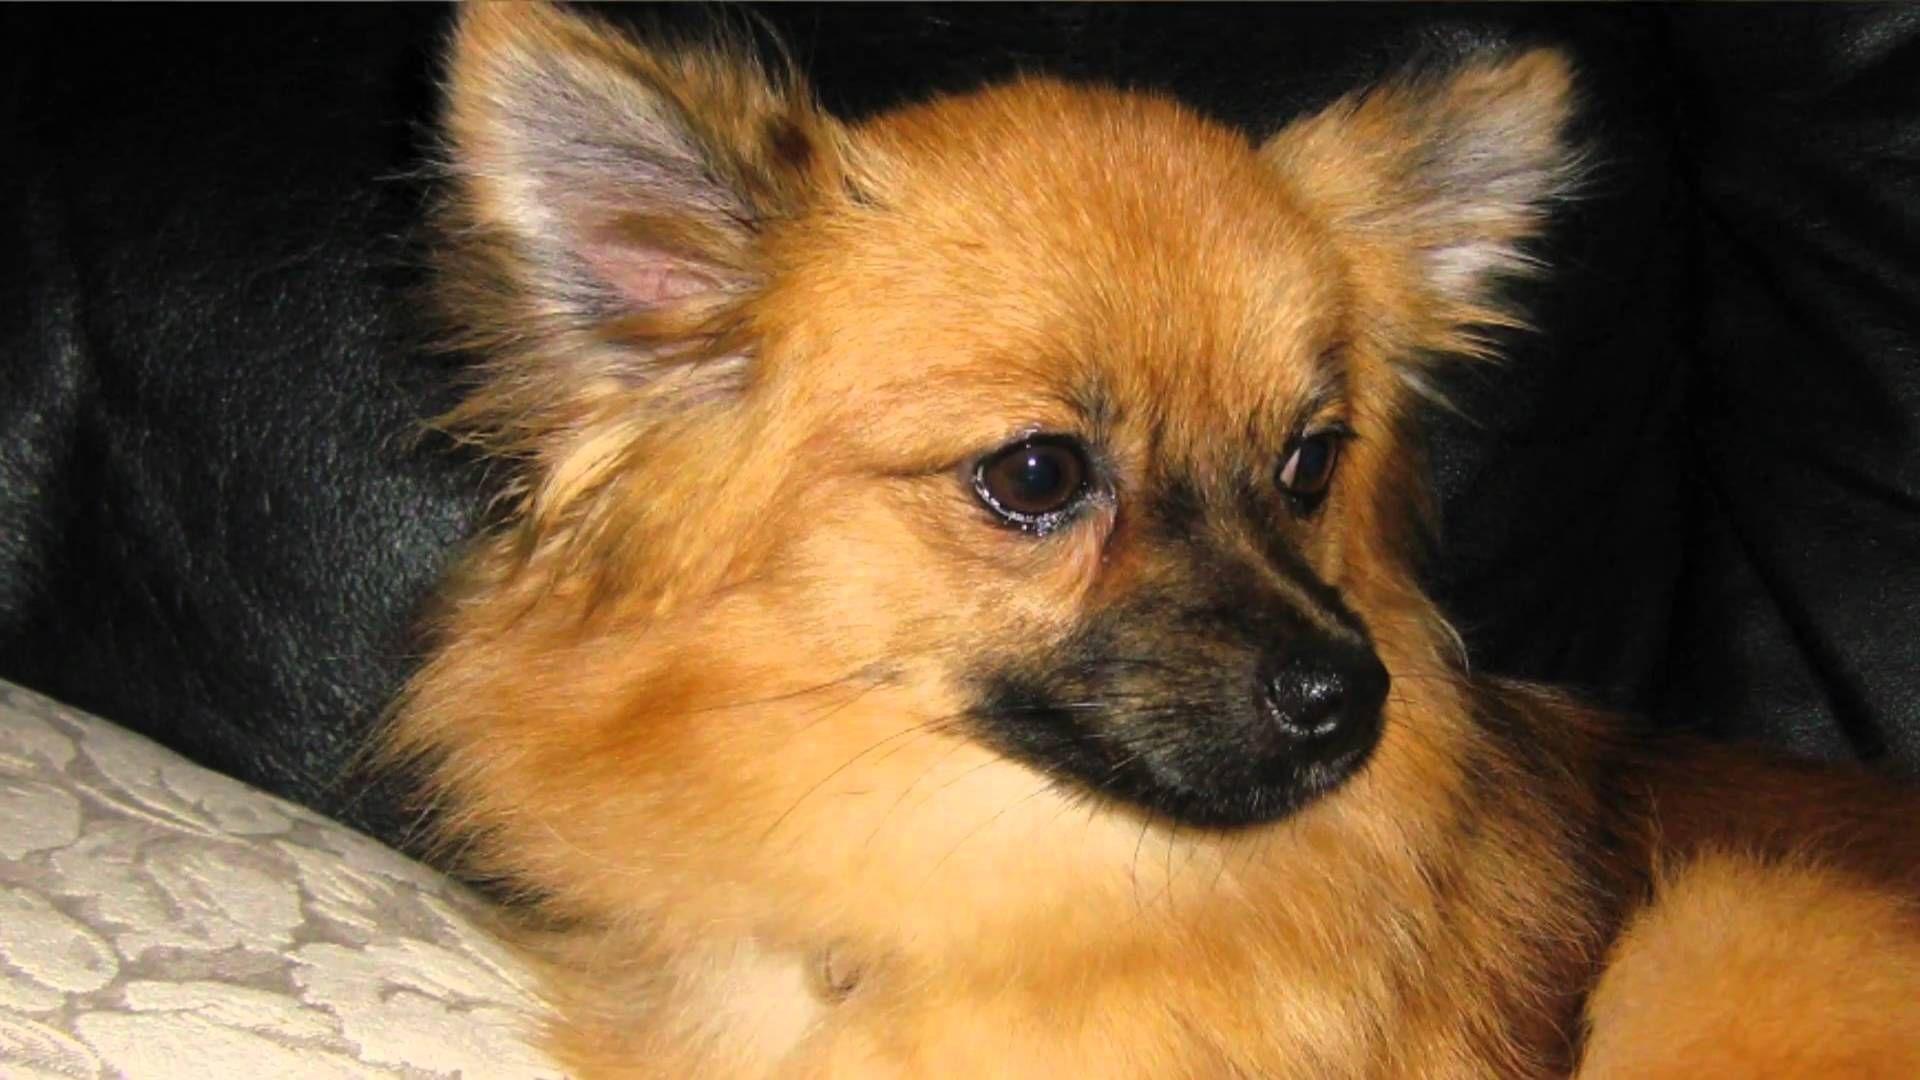 Pics photos dachshund chihuahua dog mix dogs pictures photos pics - Dog Pomeranian Chihuahua Mix